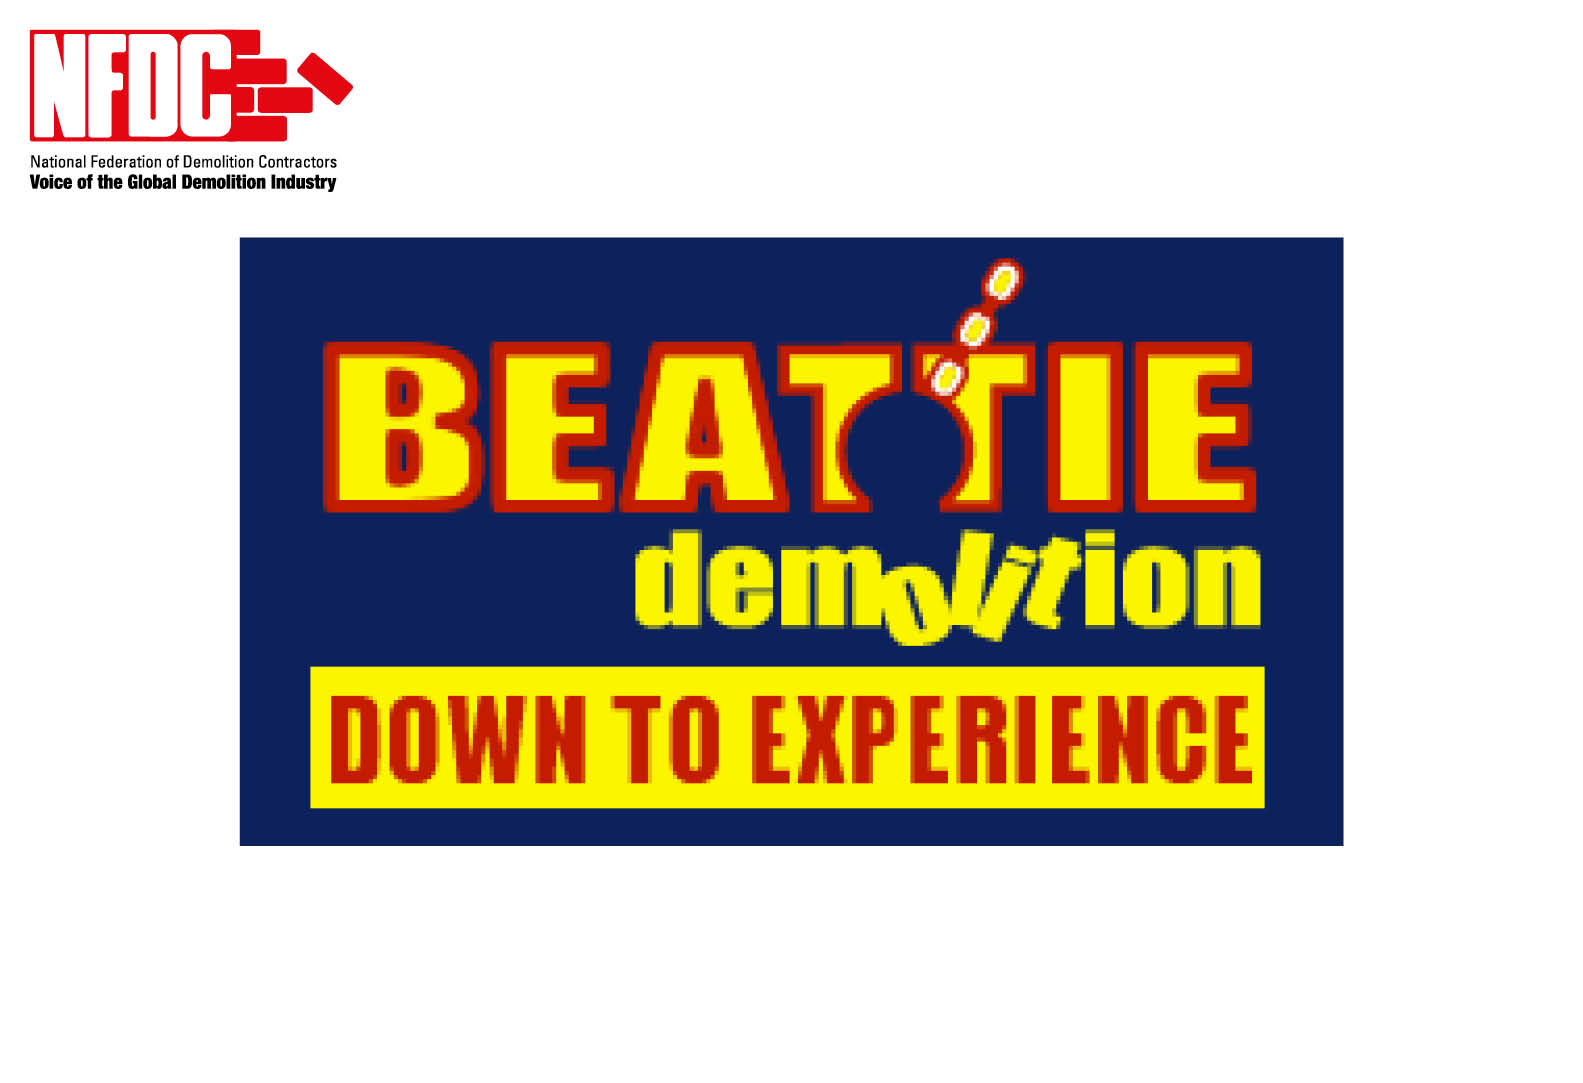 George Beattie